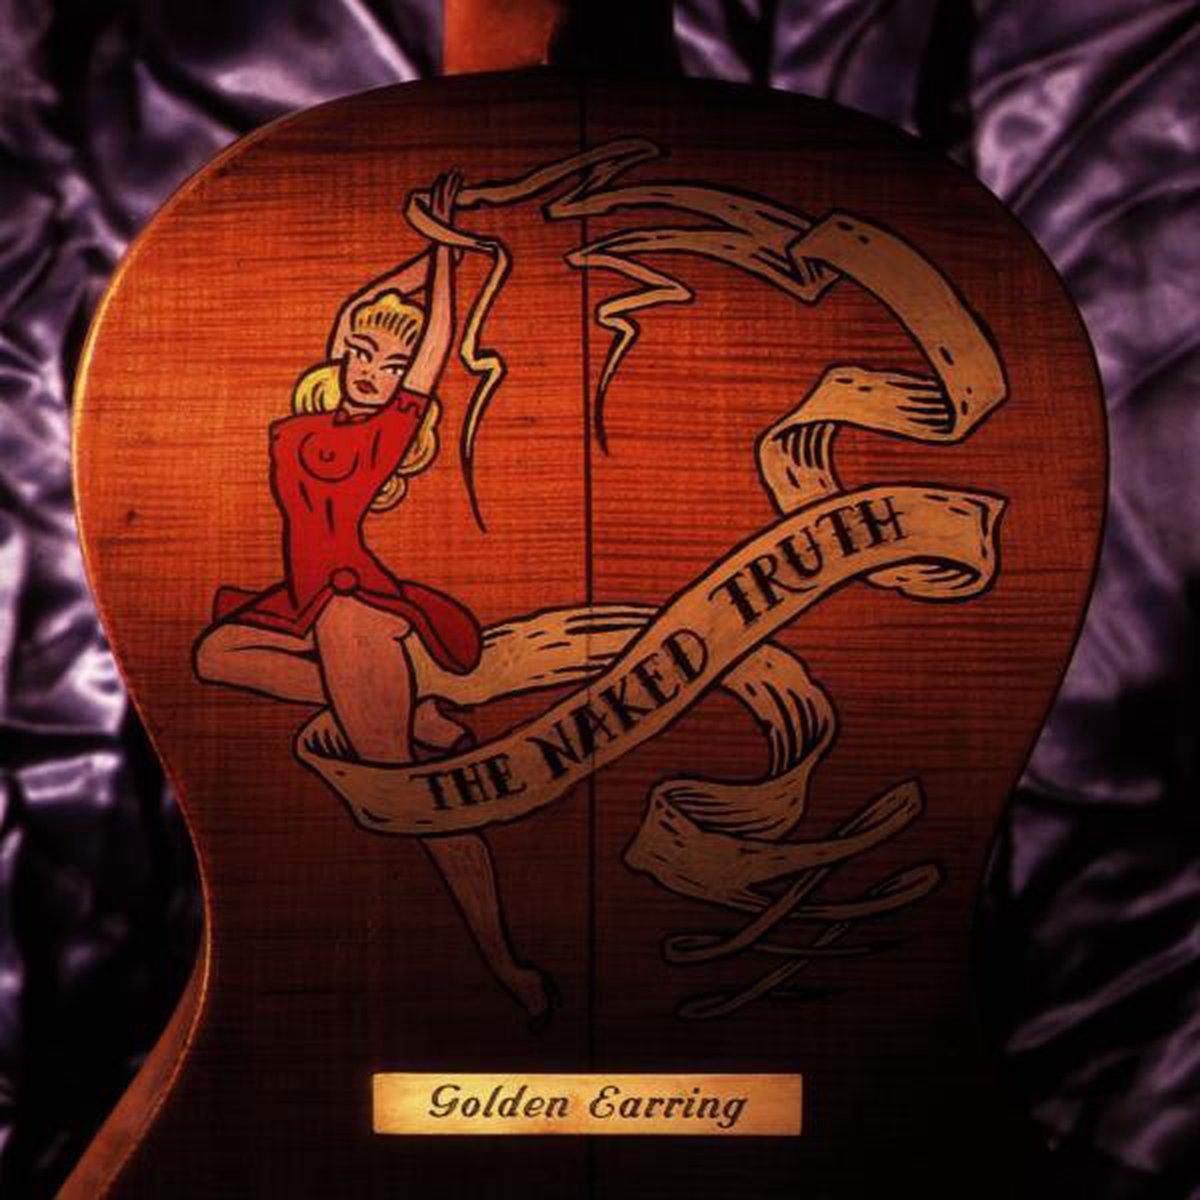 Golden Earring - The Naked Truth (1992, Cassette)   Discogs